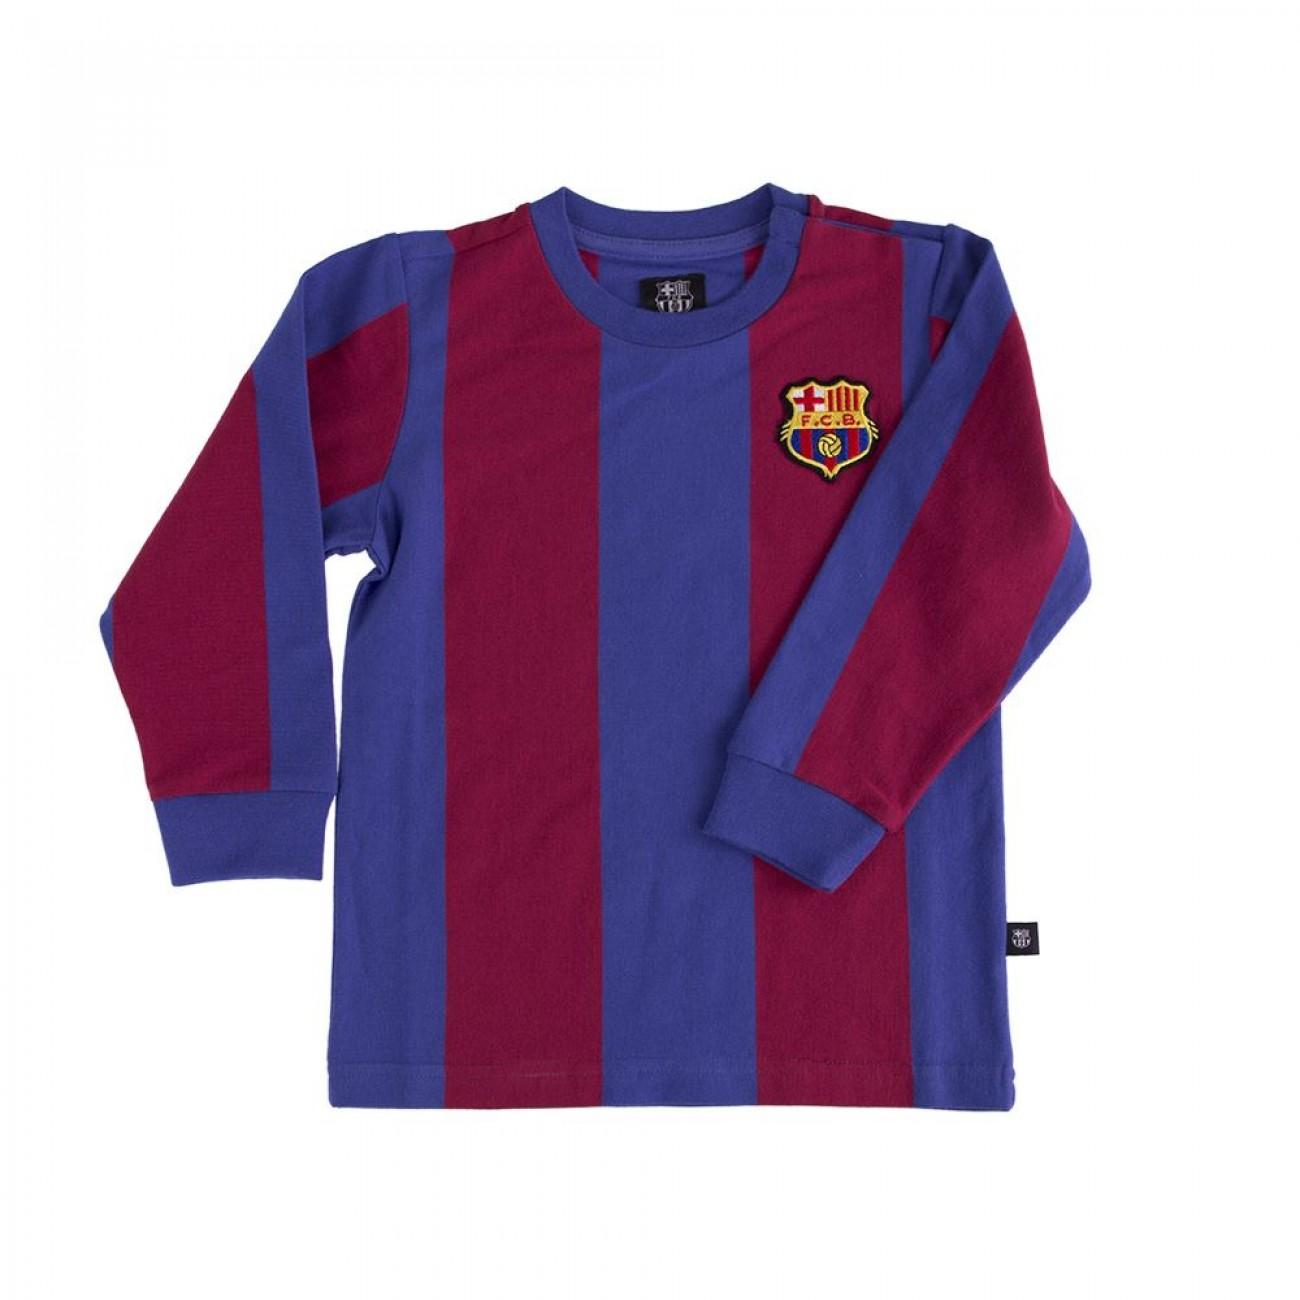 42c6185798ab2 Camiseta FC Barcelona para niños